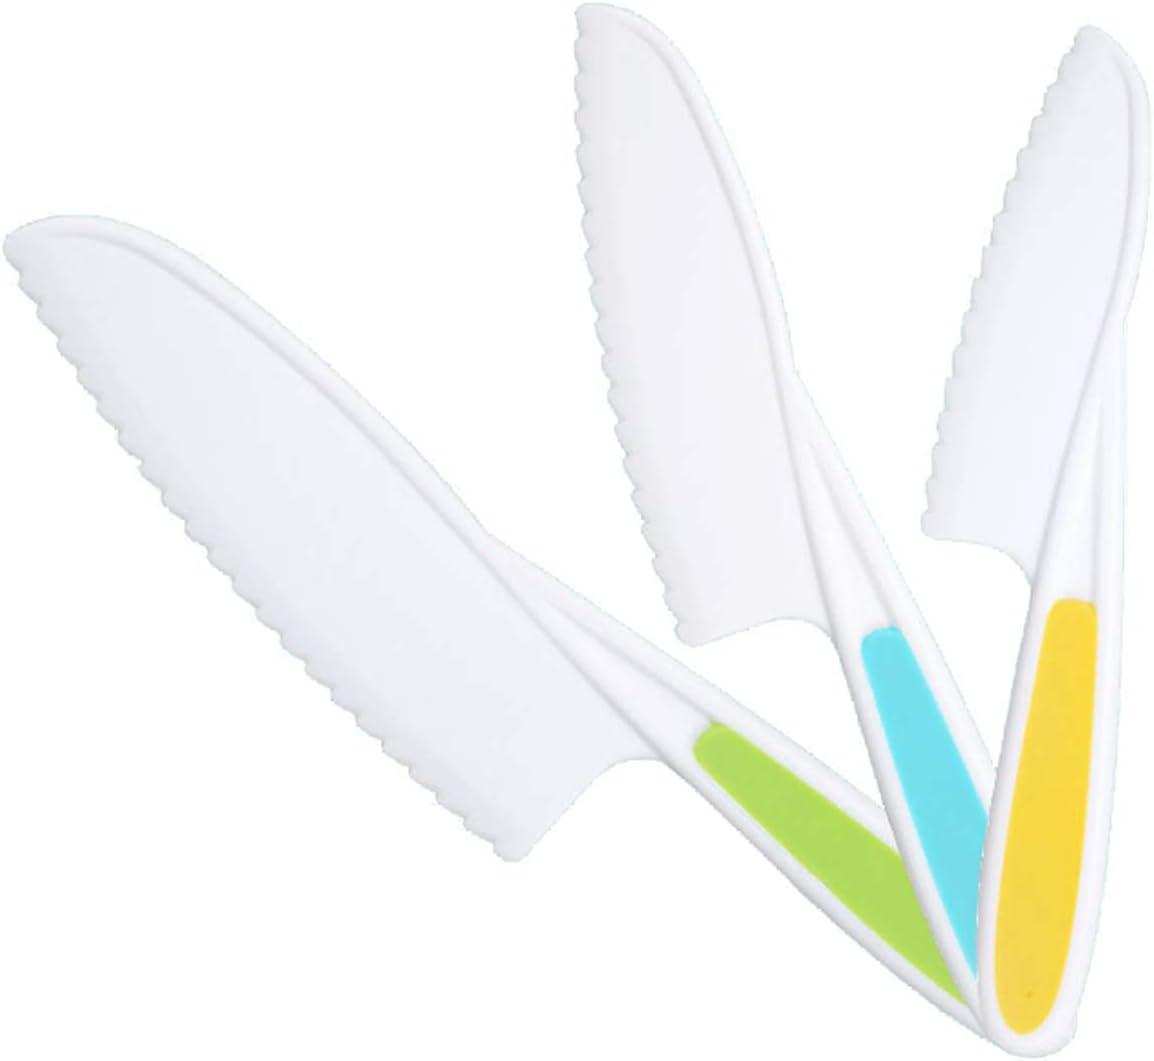 WIXe 3-Piece Child-Safe Mesa Mall Kitchen Knife Max 75% OFF Ch Children's Plastic Set